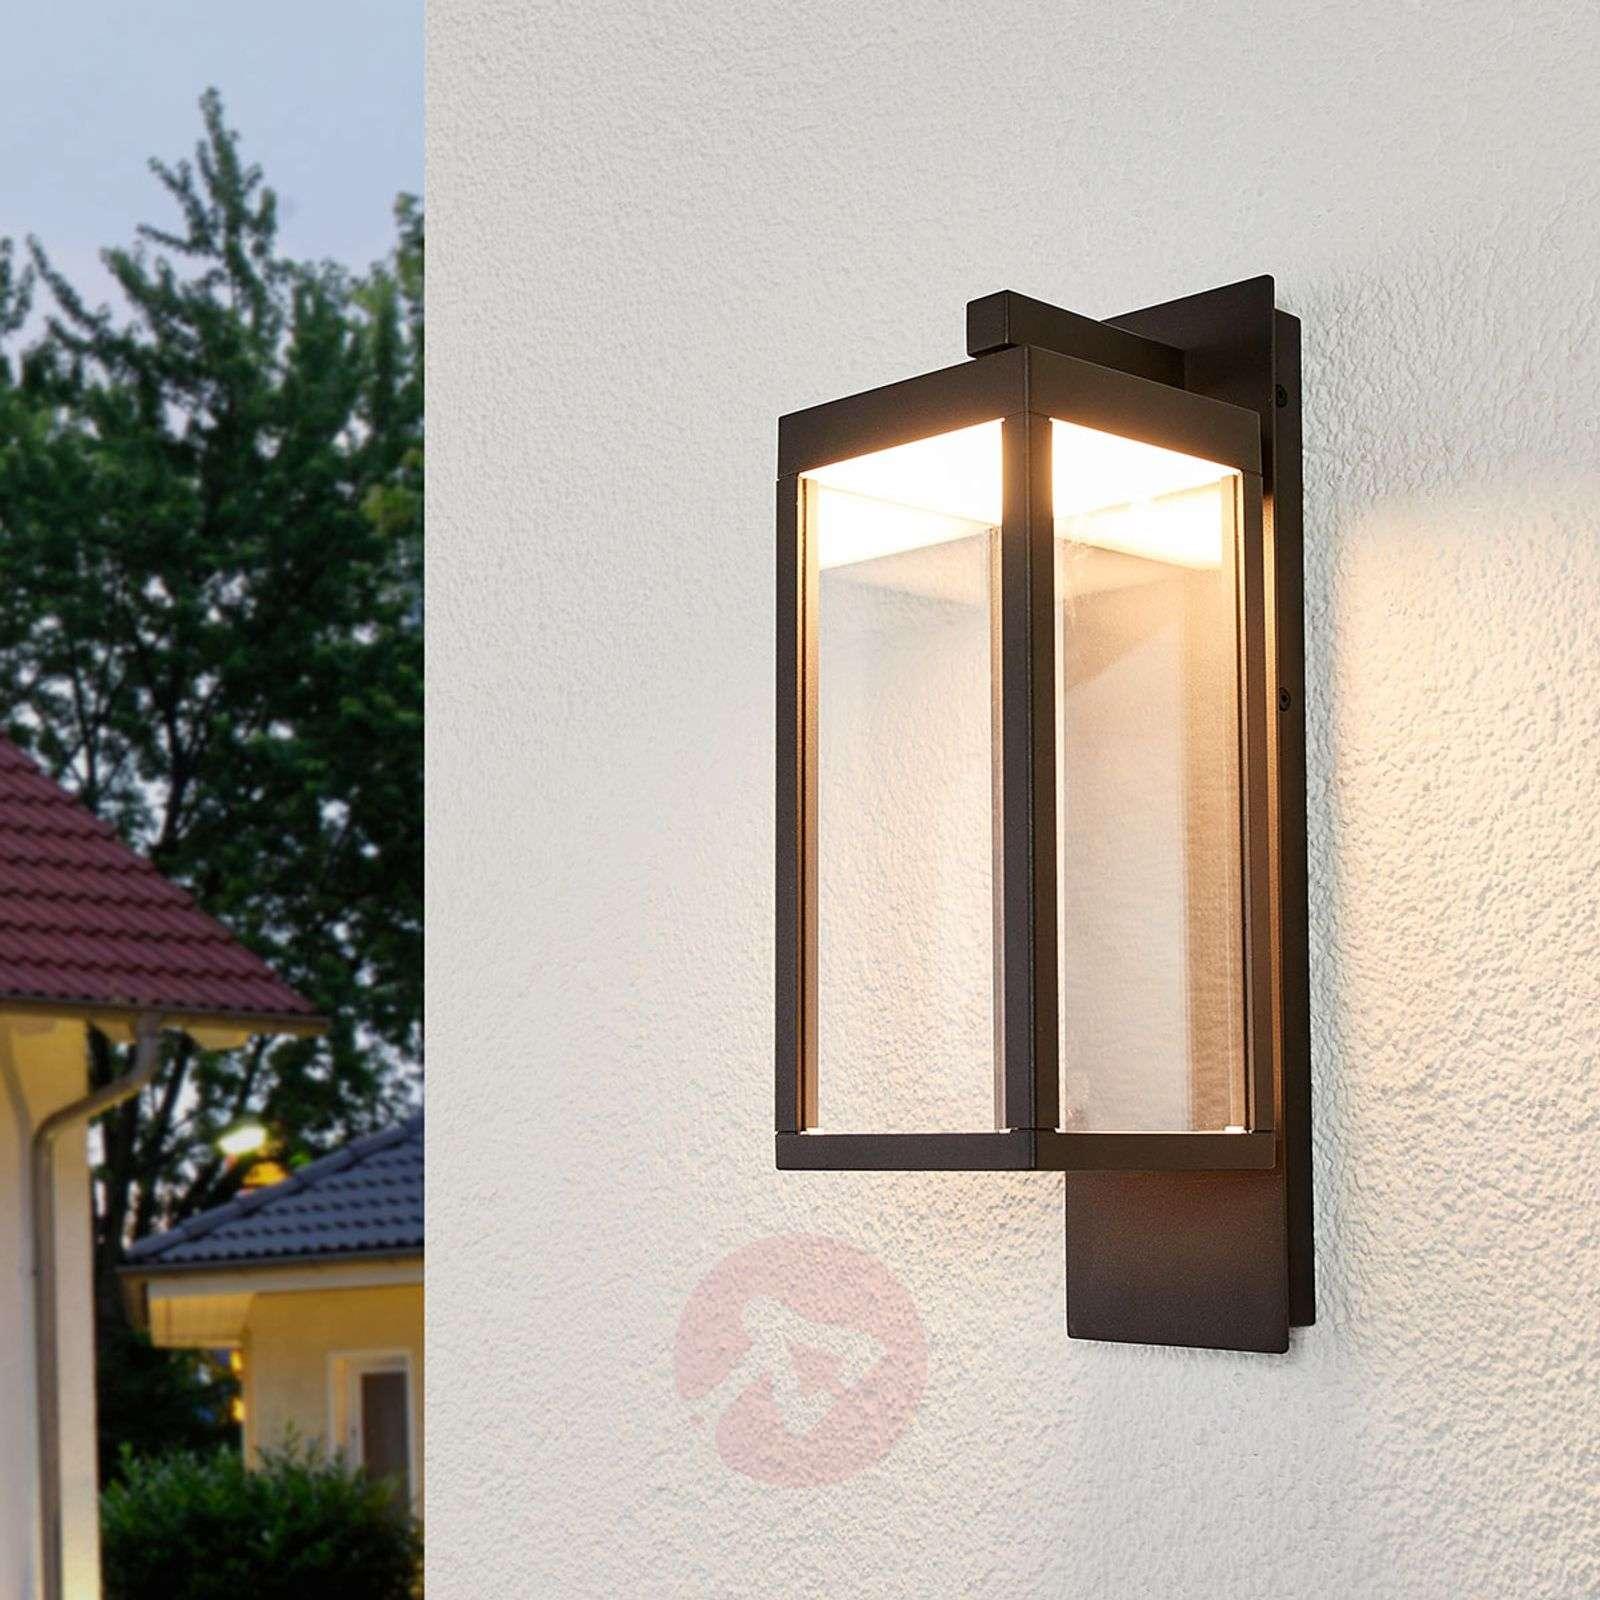 Lantern-shaped LED outdoor wall light Ferdinand-9619149-03